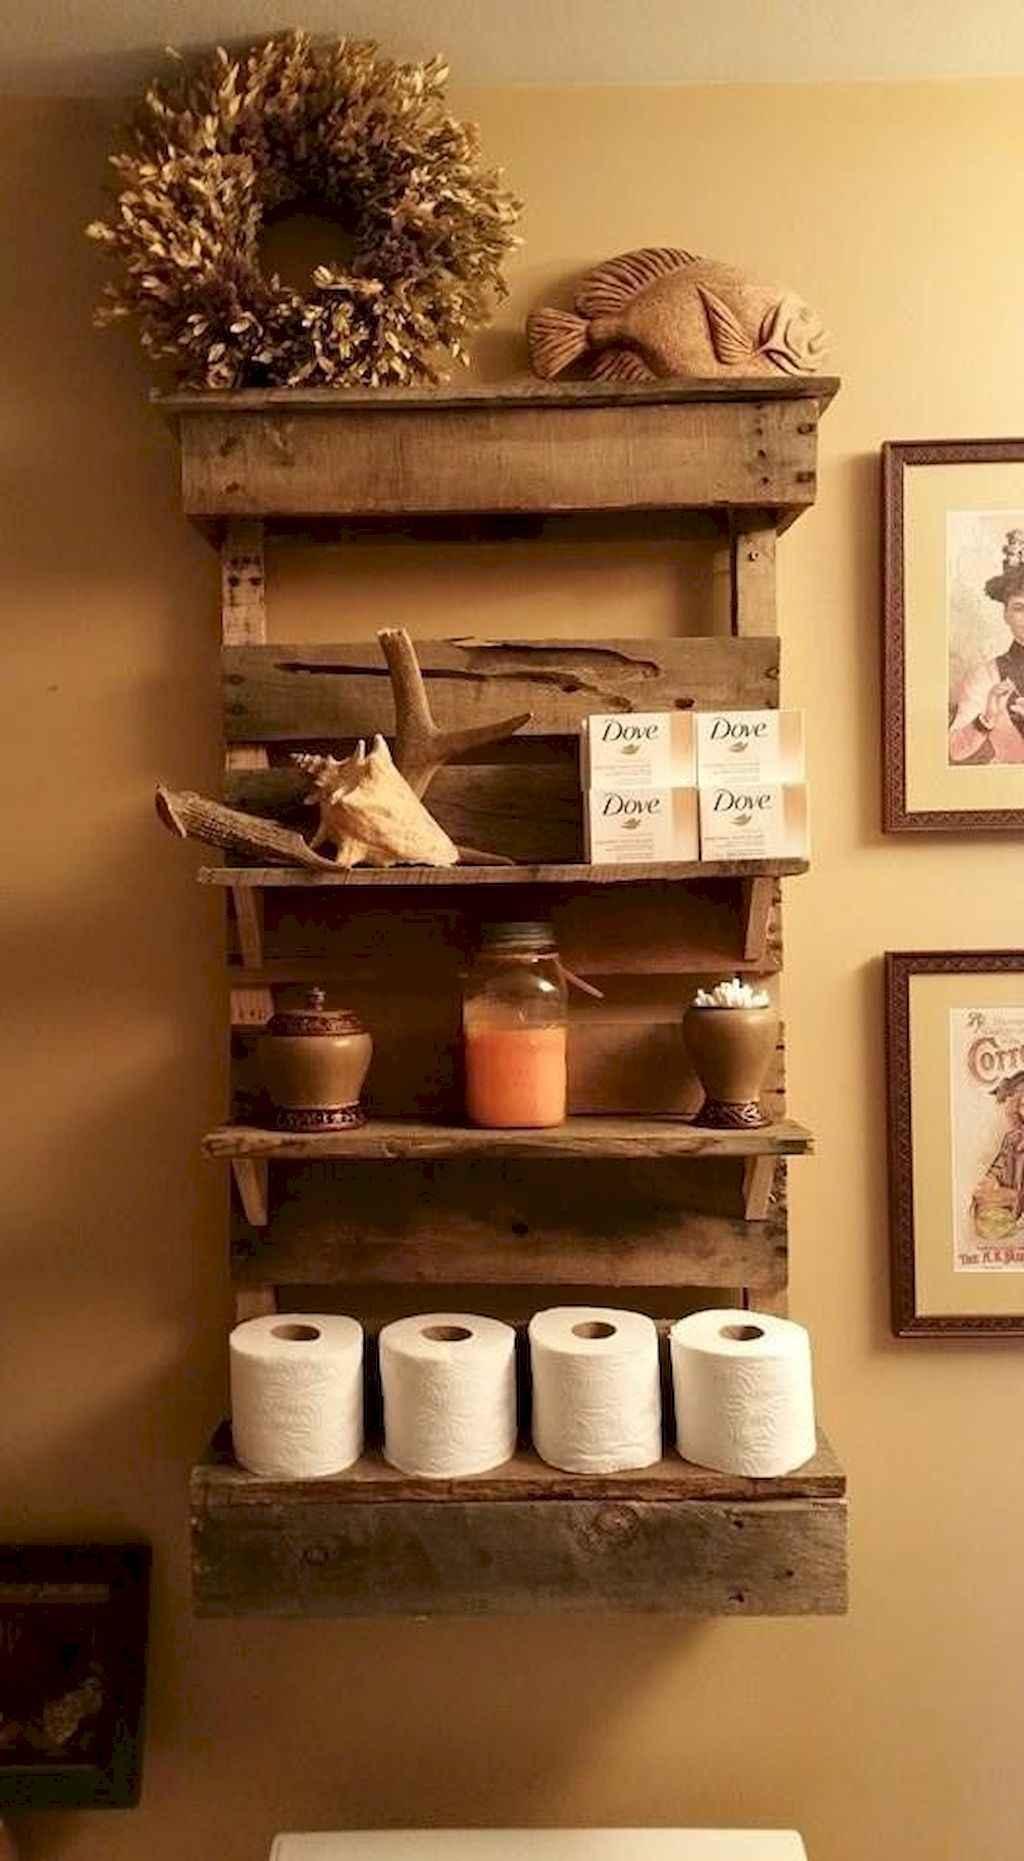 Inspiring rustic bathroom decor ideas (5)